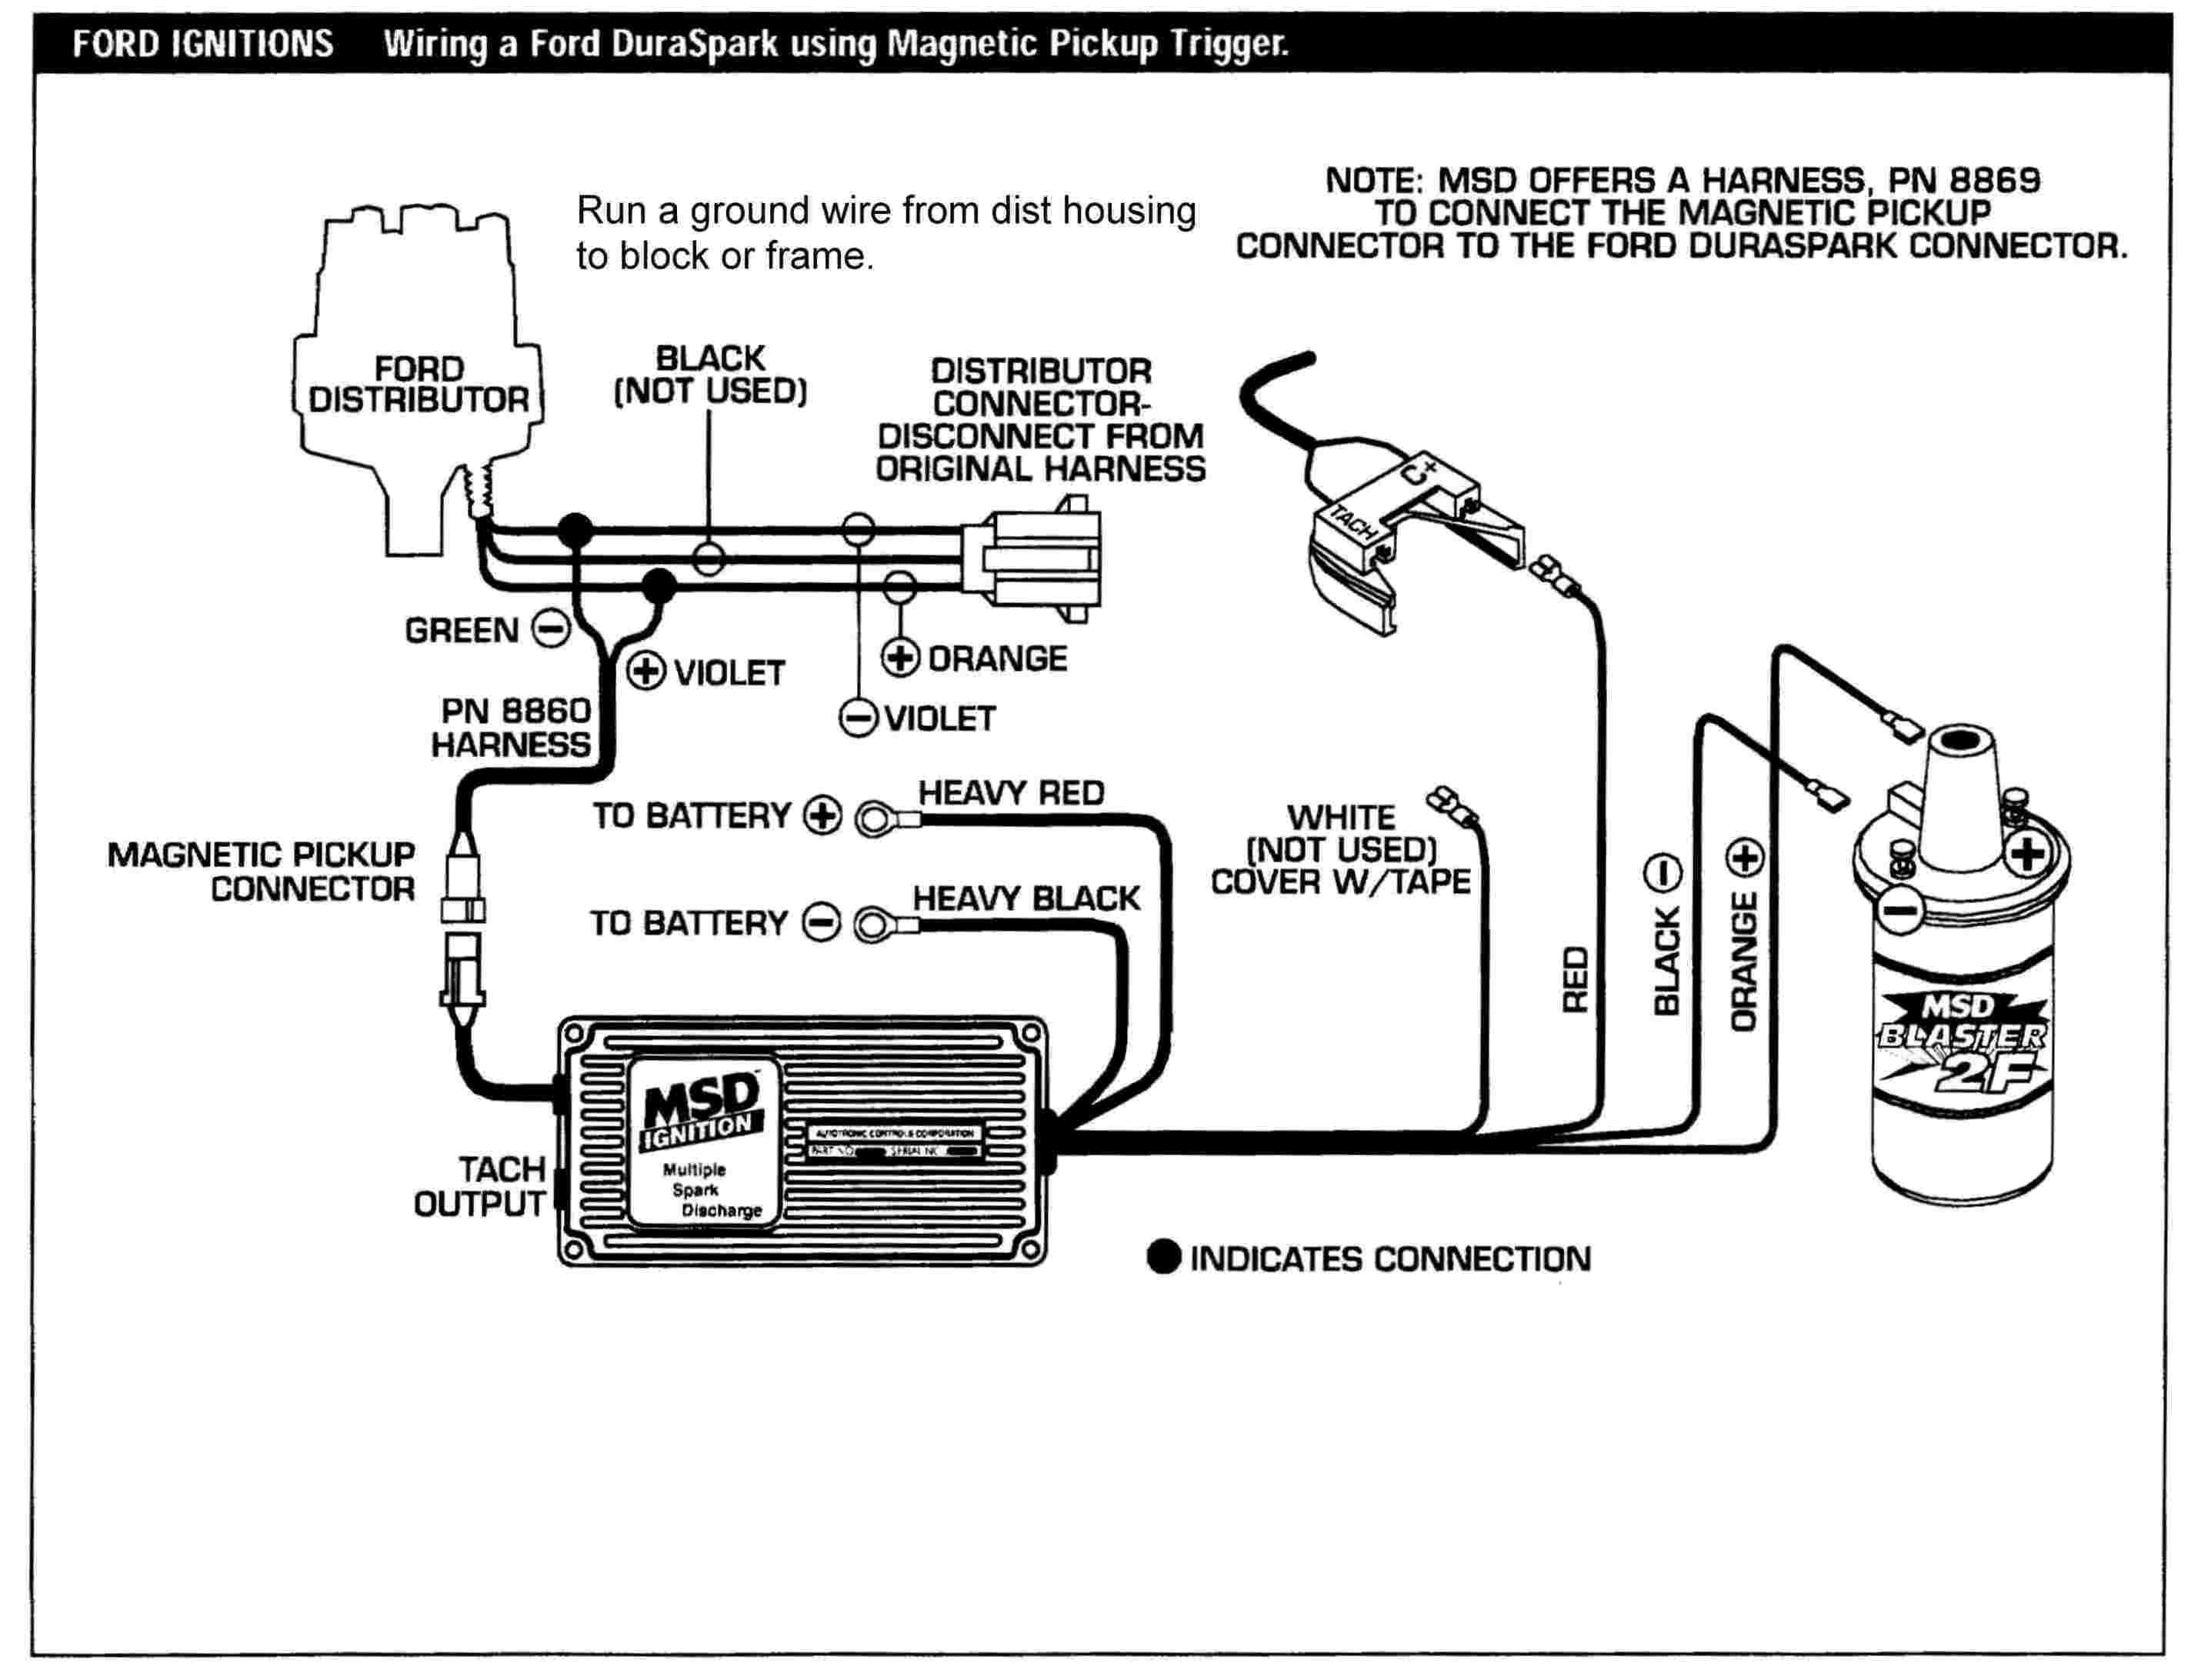 Mallory Ignition Wiring Diagram Vw Mk1 - Wiring Diagrams SiteNew Flesh Creative Lab